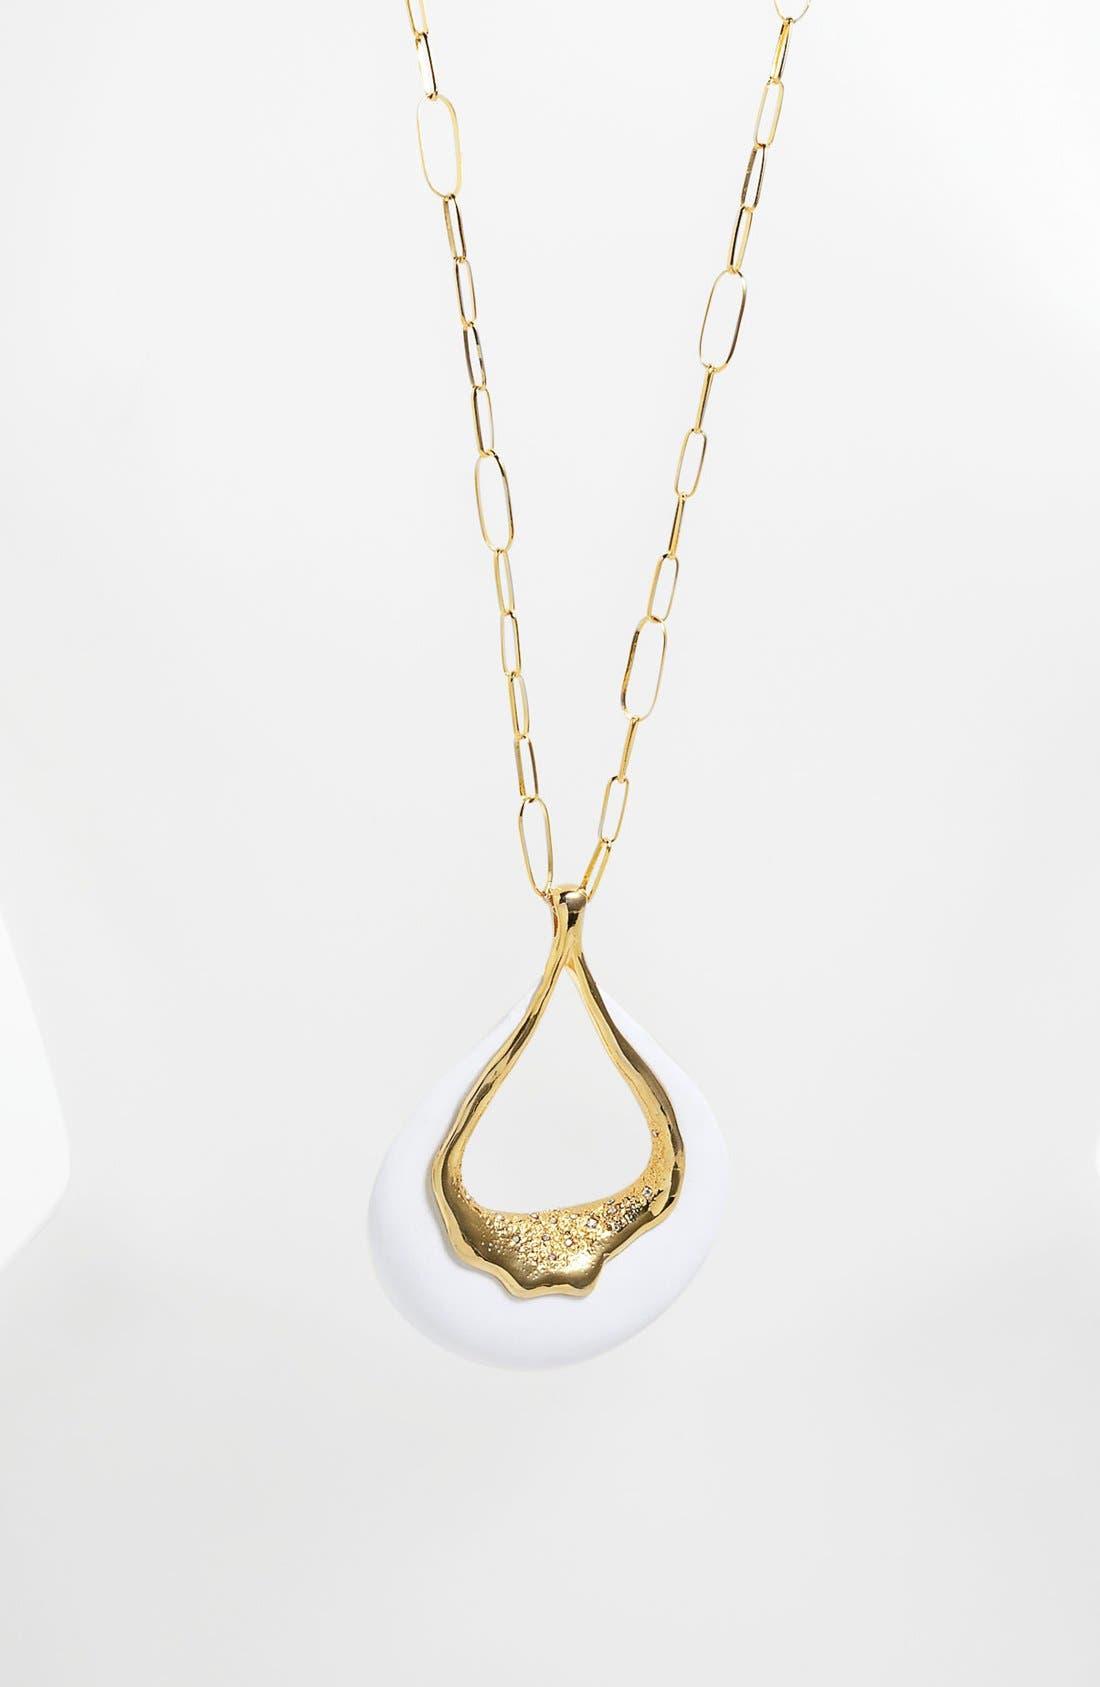 Main Image - Alexis Bittar 'Miss Havisham - Liquid Gold' Long Pendant Necklace